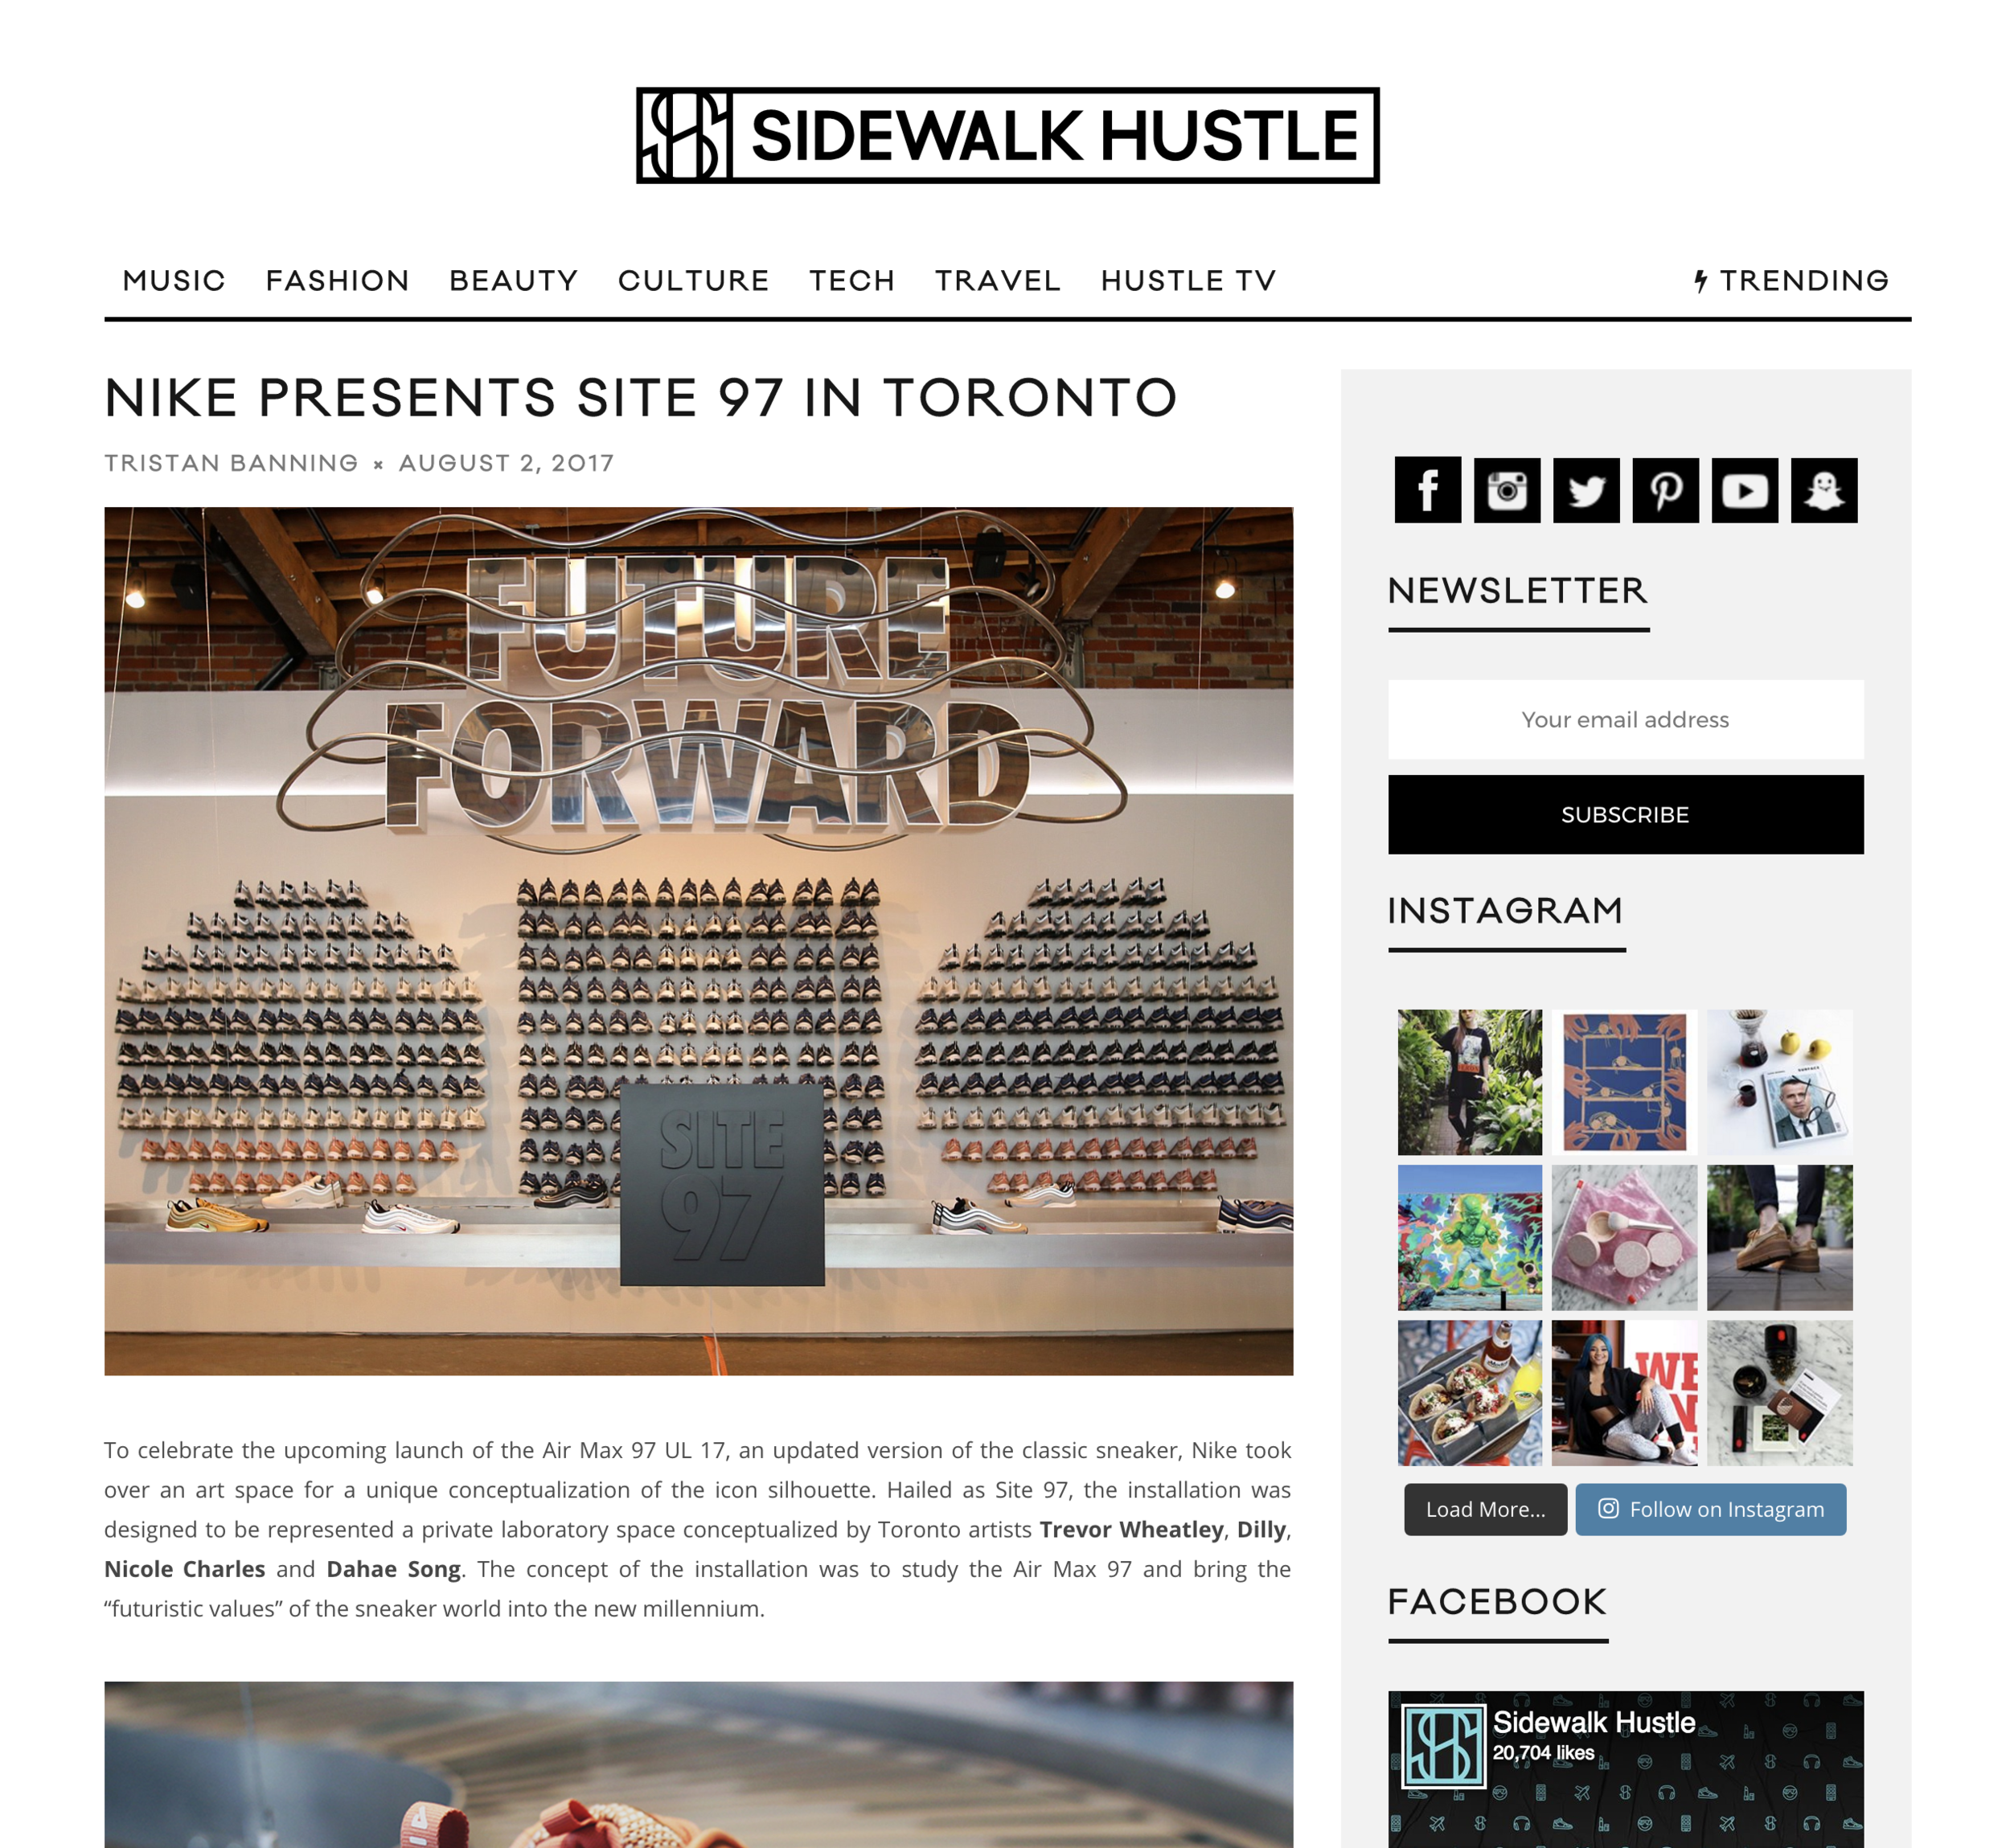 Sidewalk Hustle, 2017